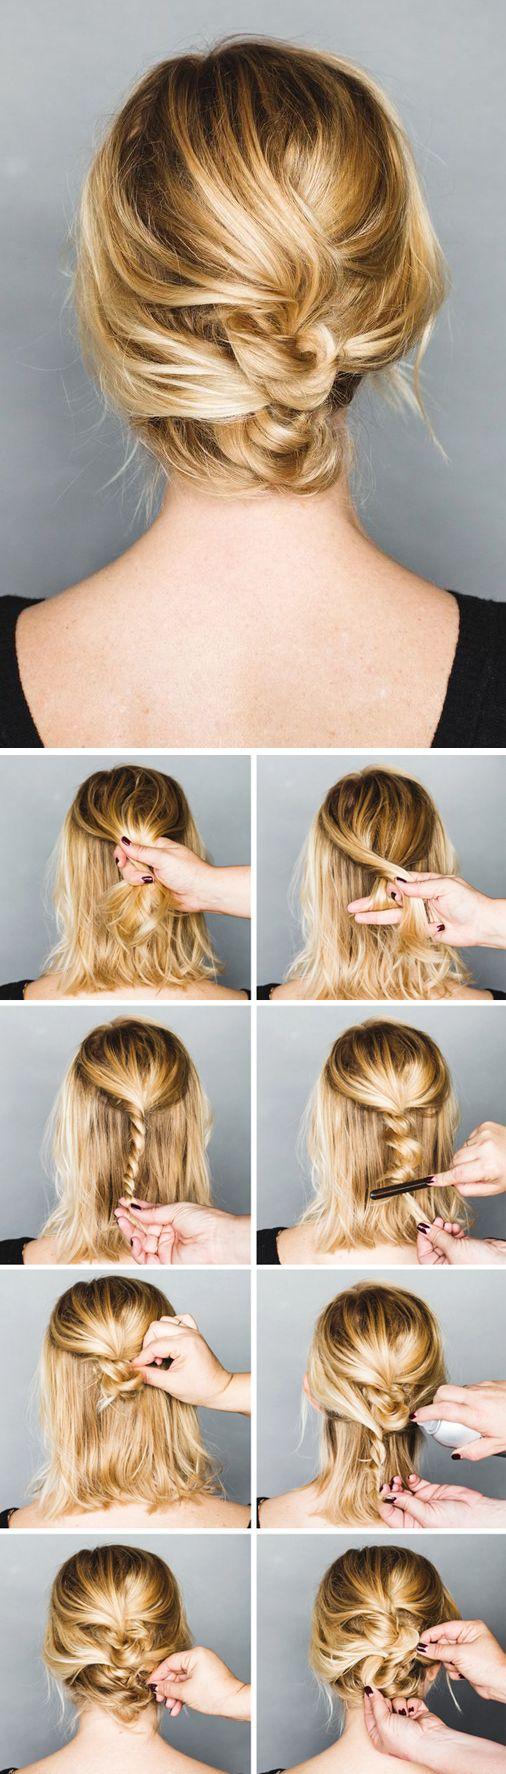 Pinterest boocute hairstyles pinterest updo messy updo